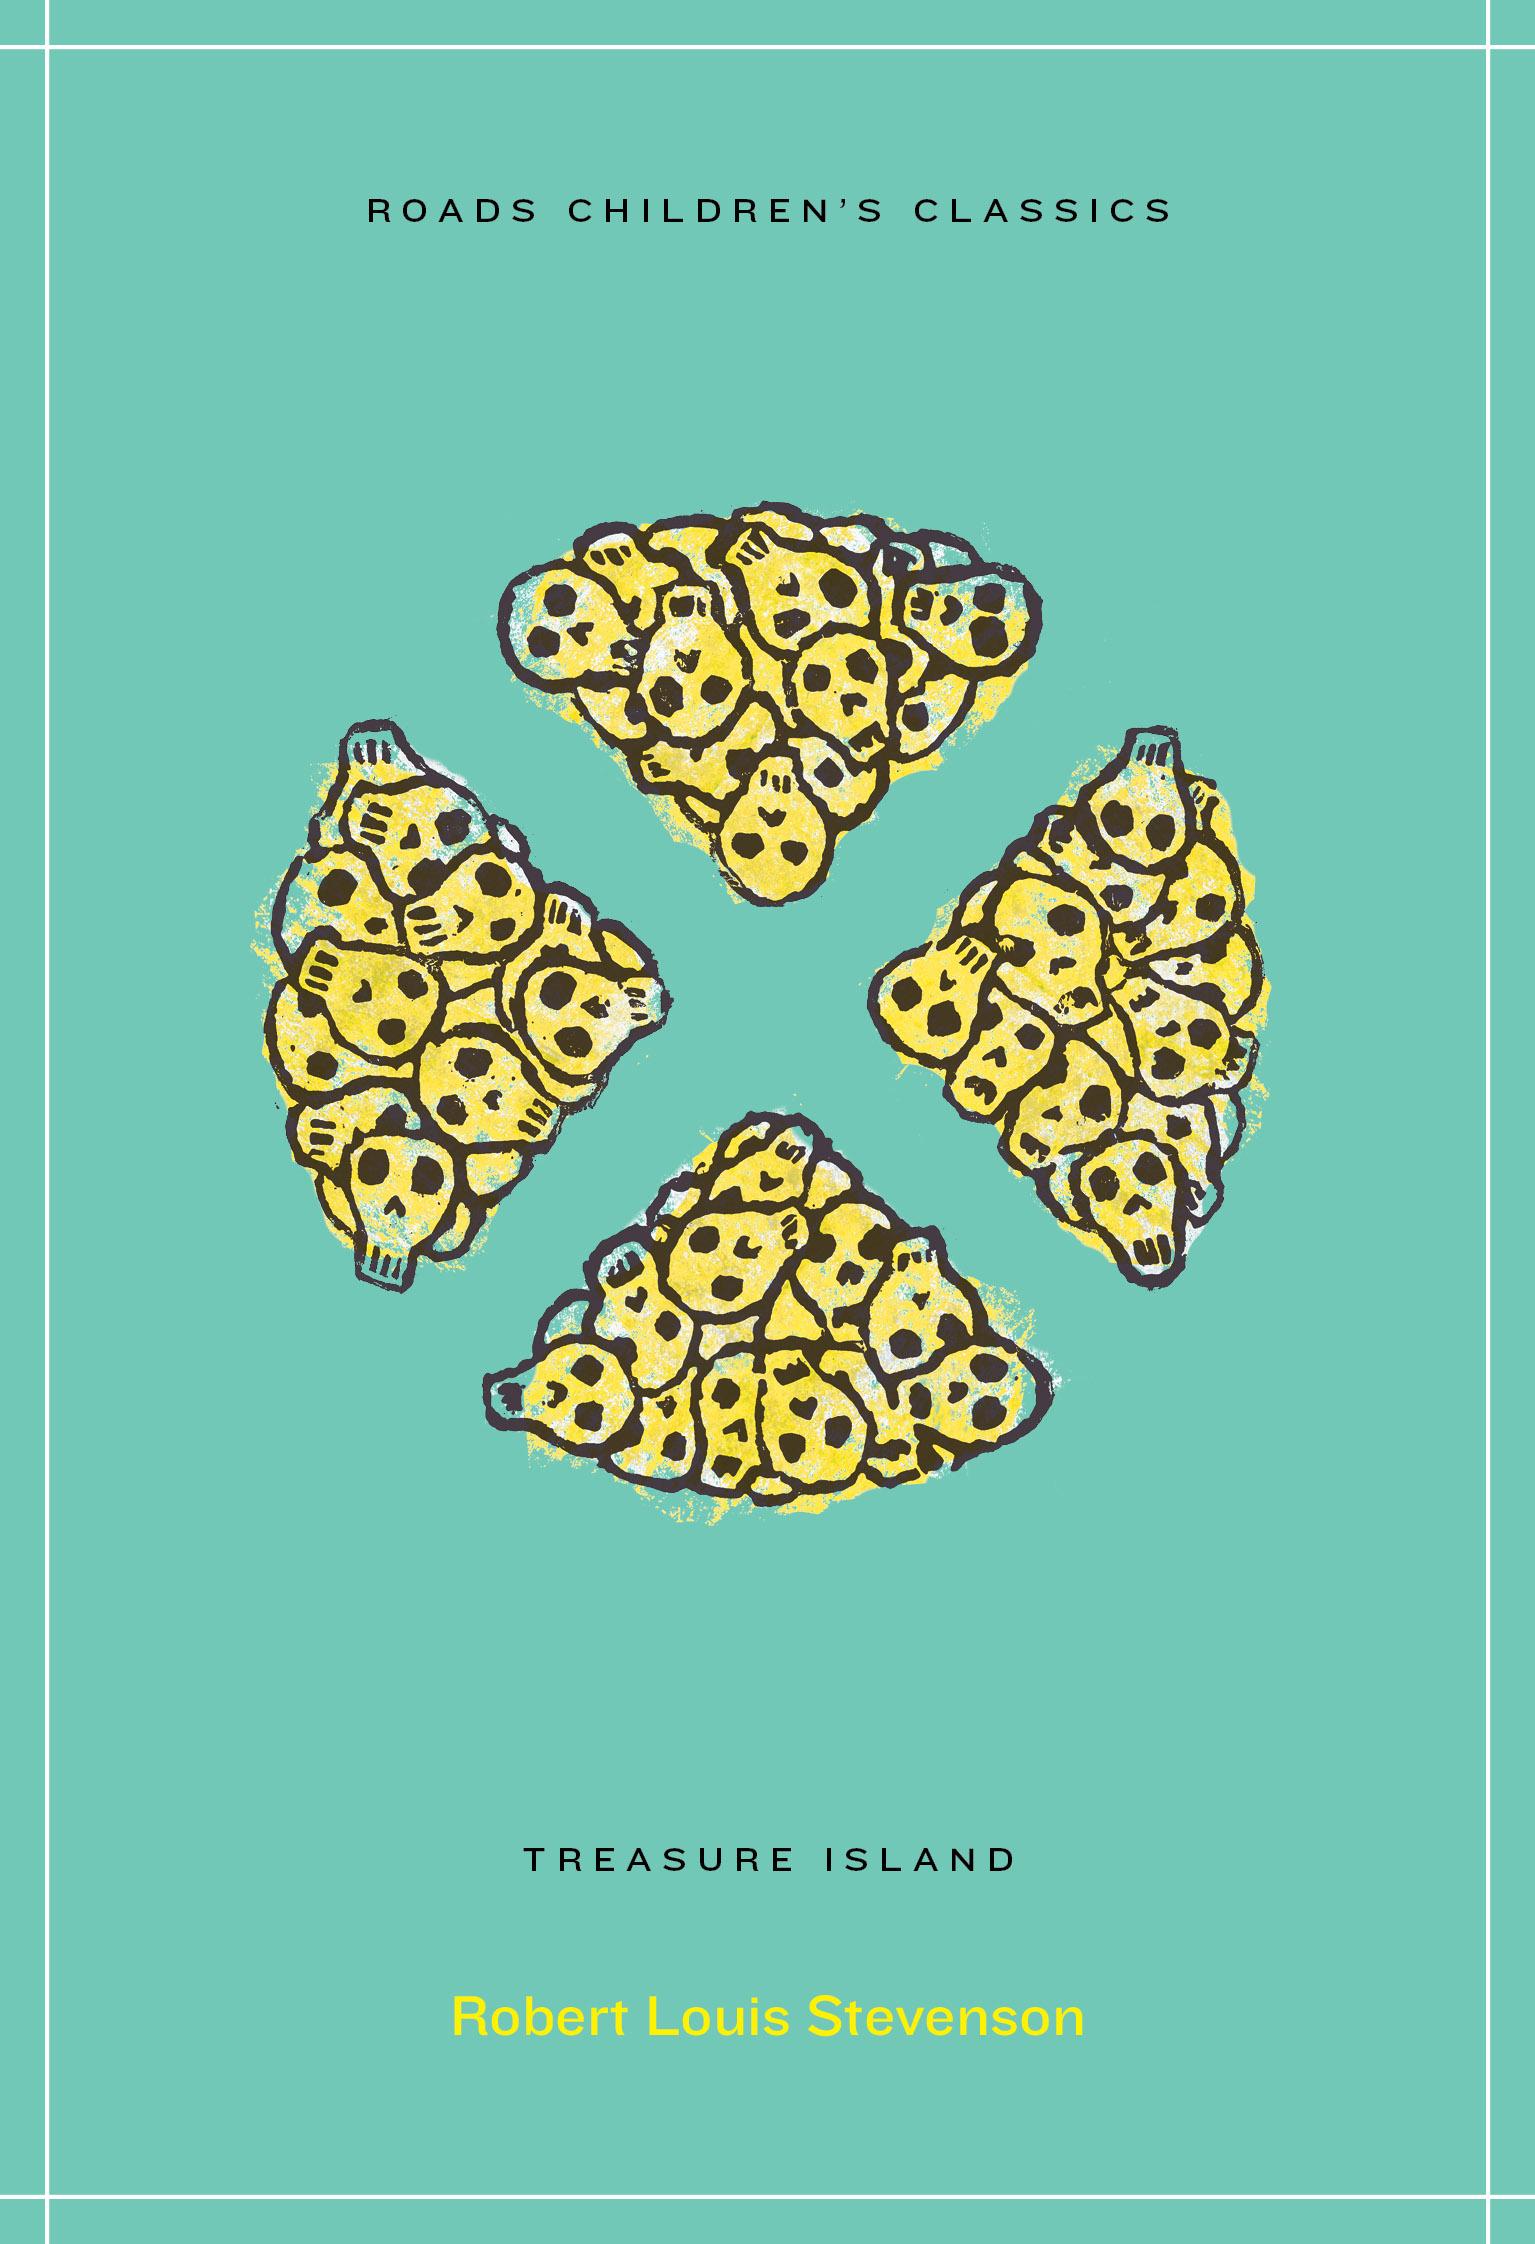 Cover image: Treasure Island